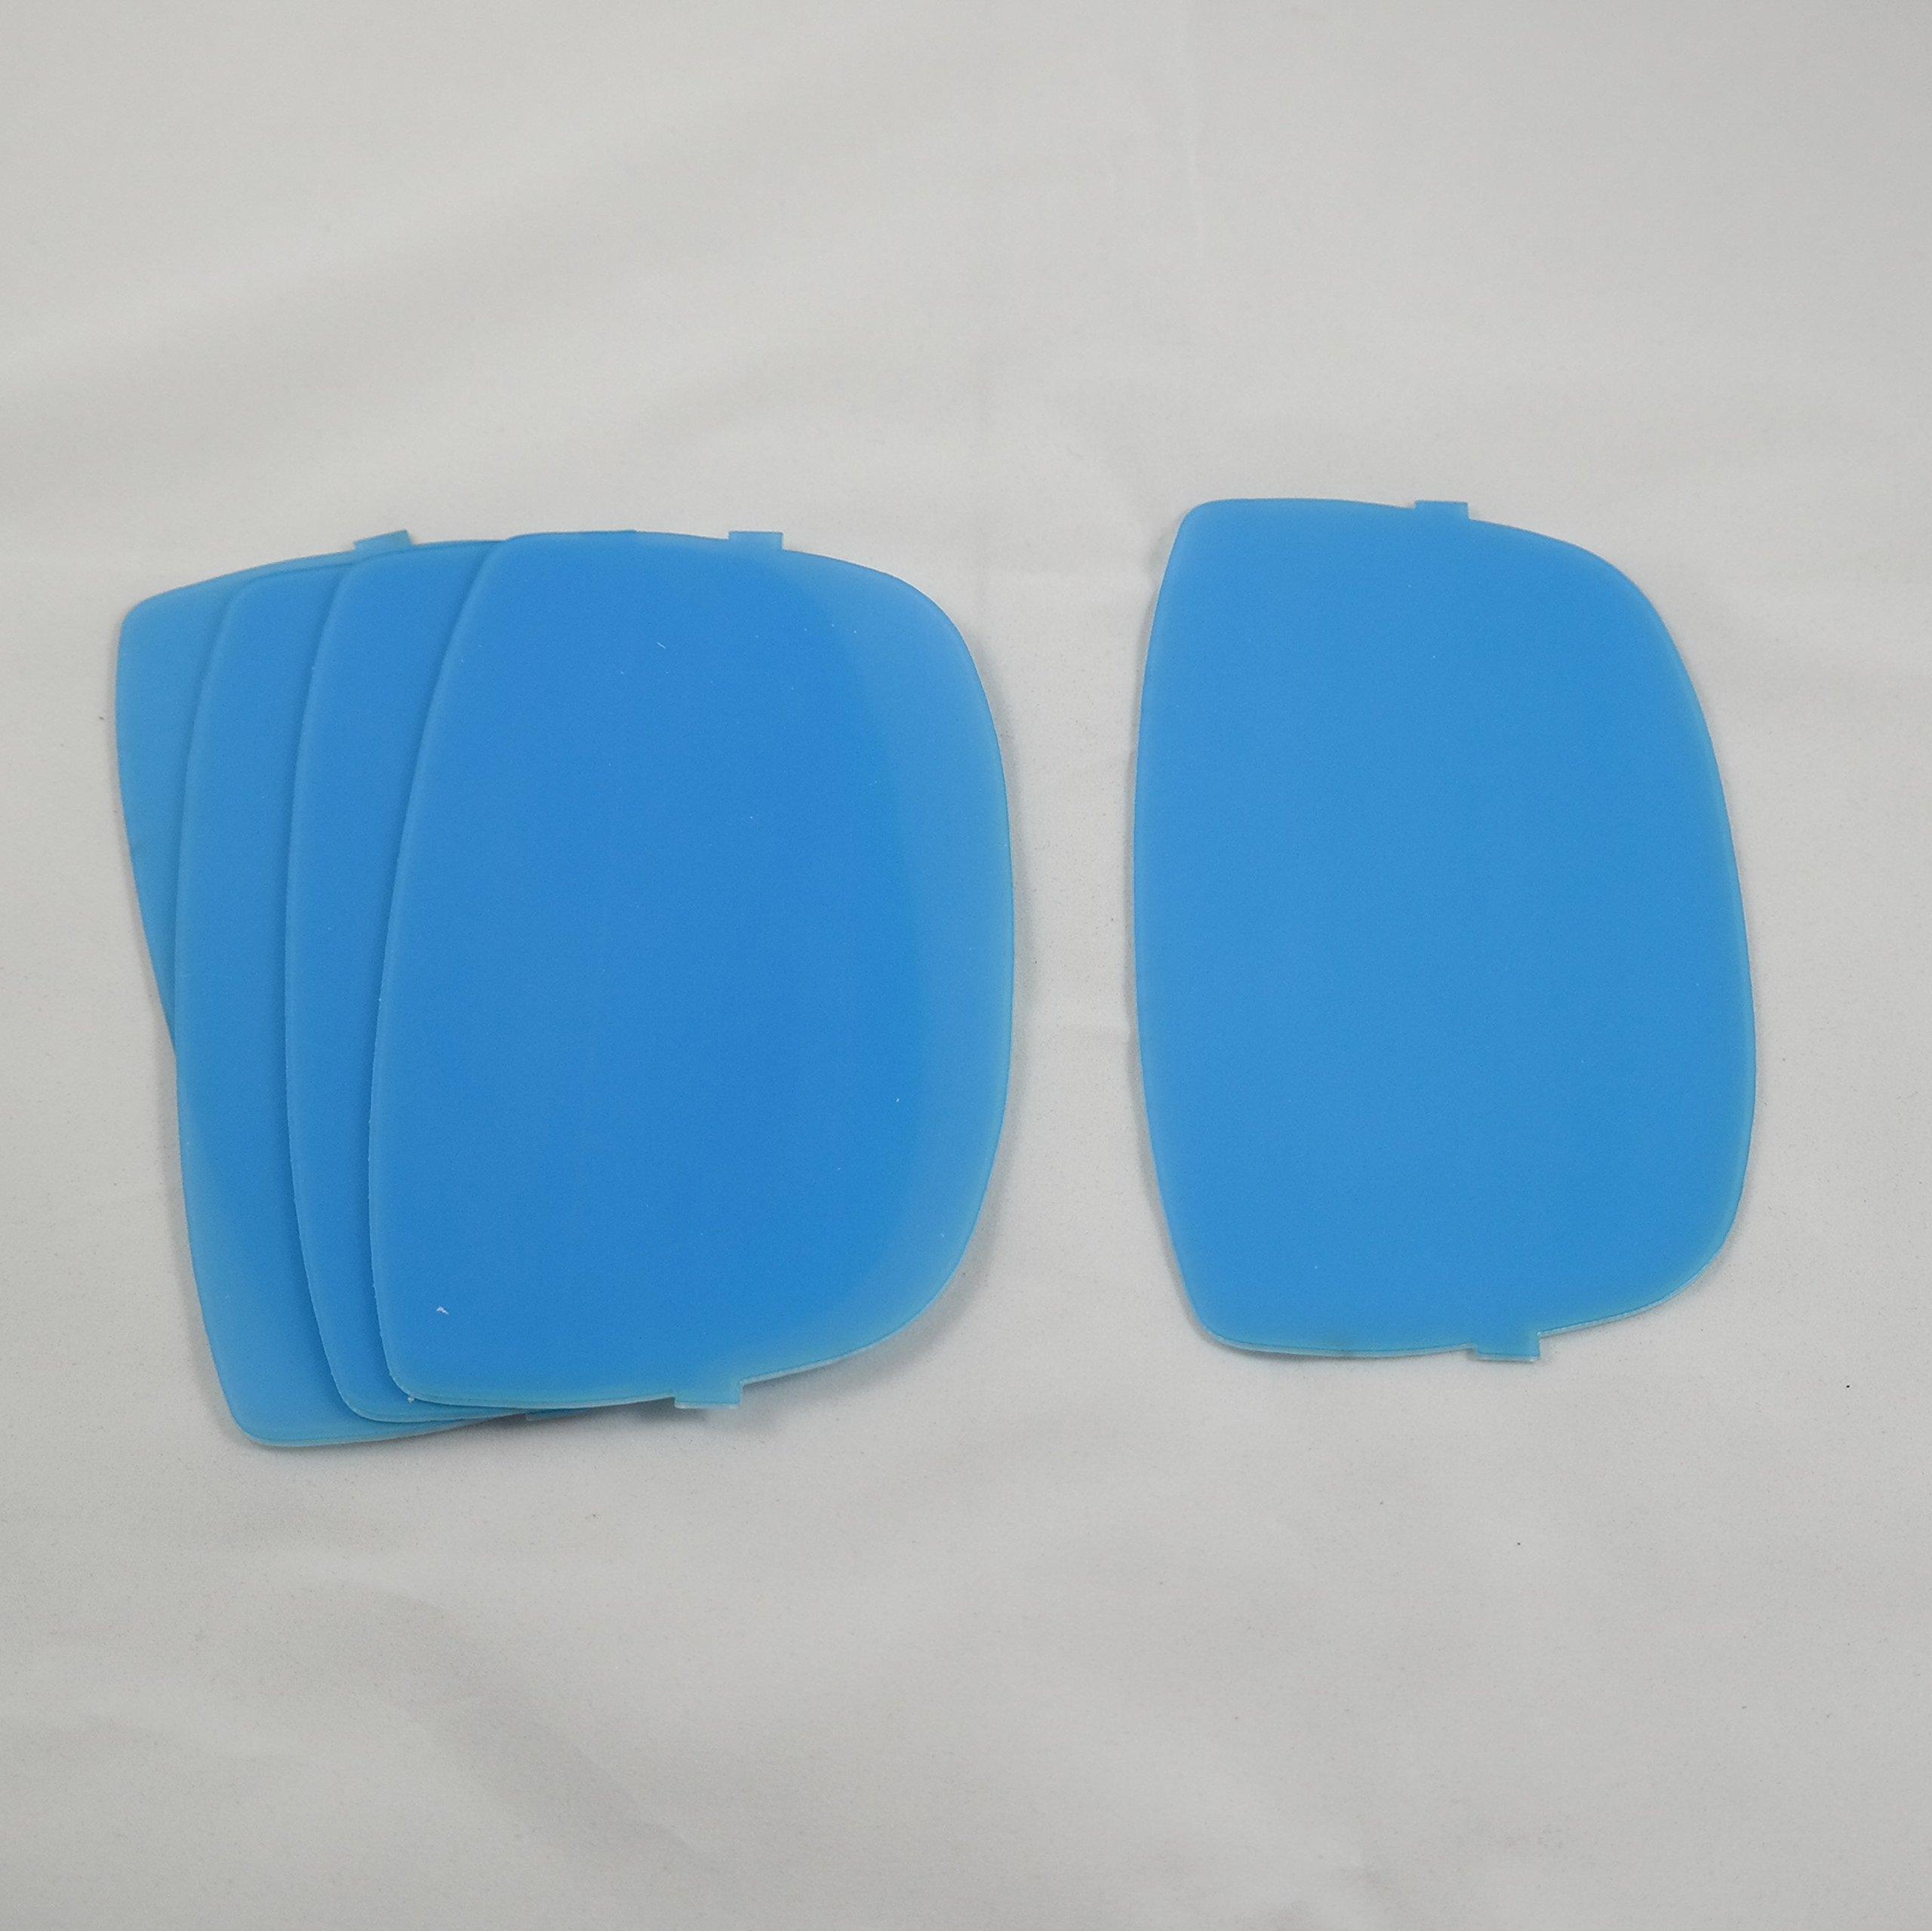 3M Speedglas Clear Cover Lens 04-0270-00 Utility,9000F,9000XF,9000X,9002V,9002X